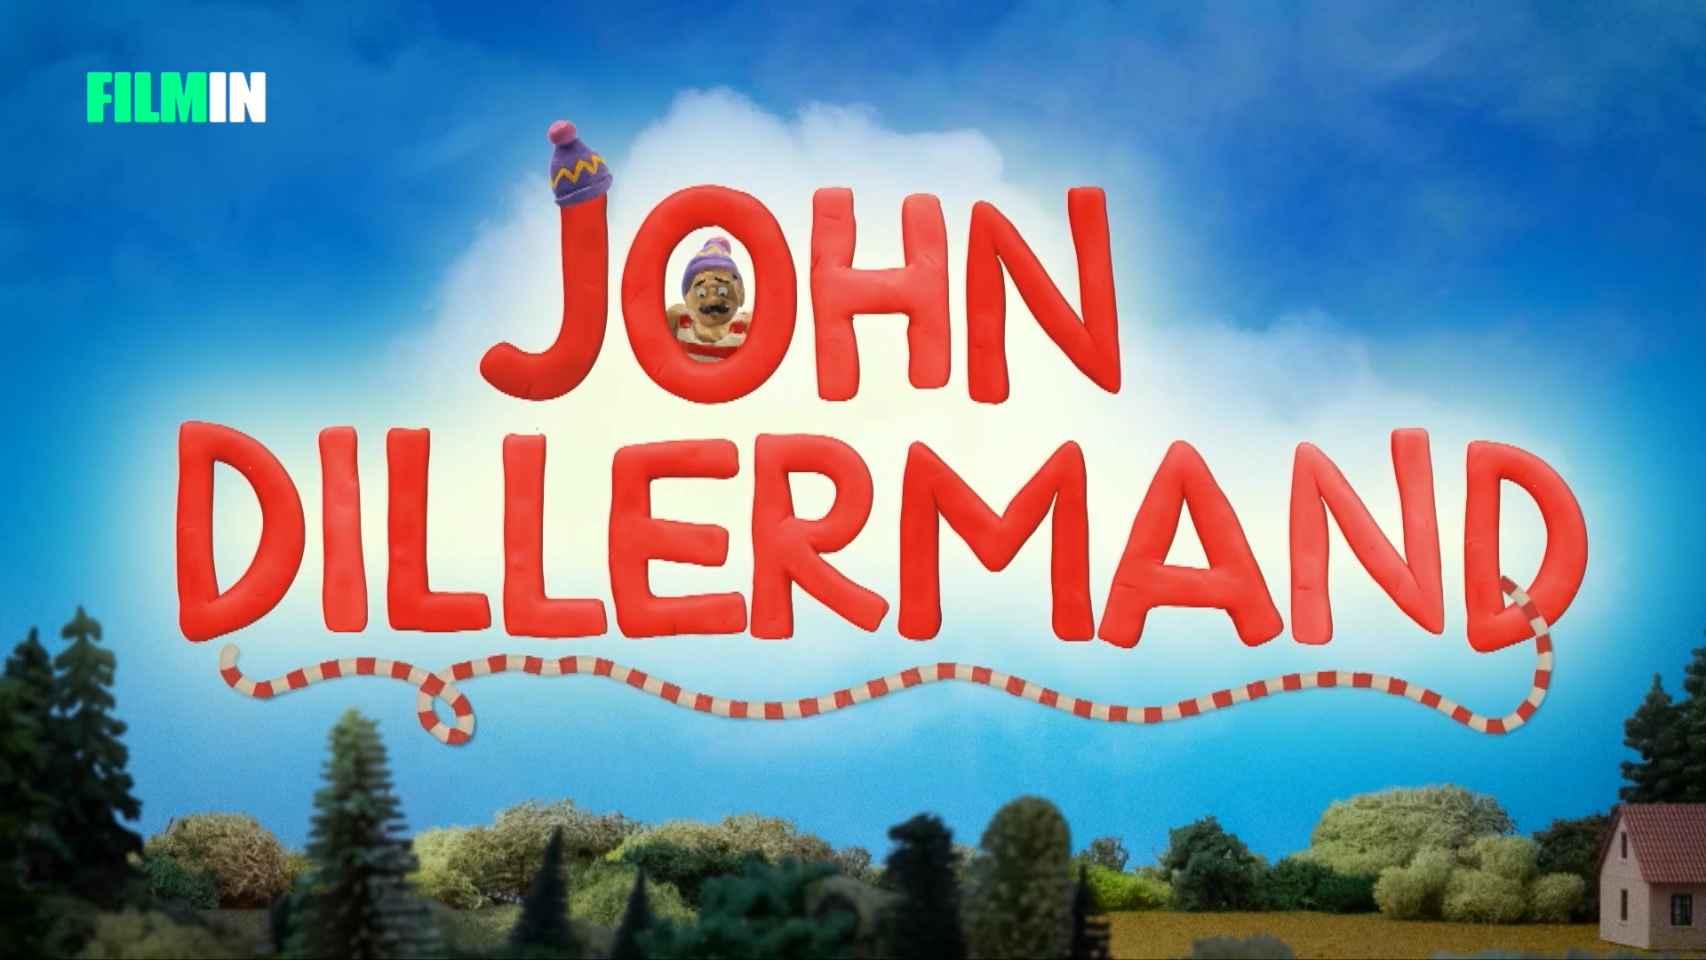 Filmin estrena 'Juan Pilila', la polémica serie infantil sobre el hombre con el pene más largo del mundo